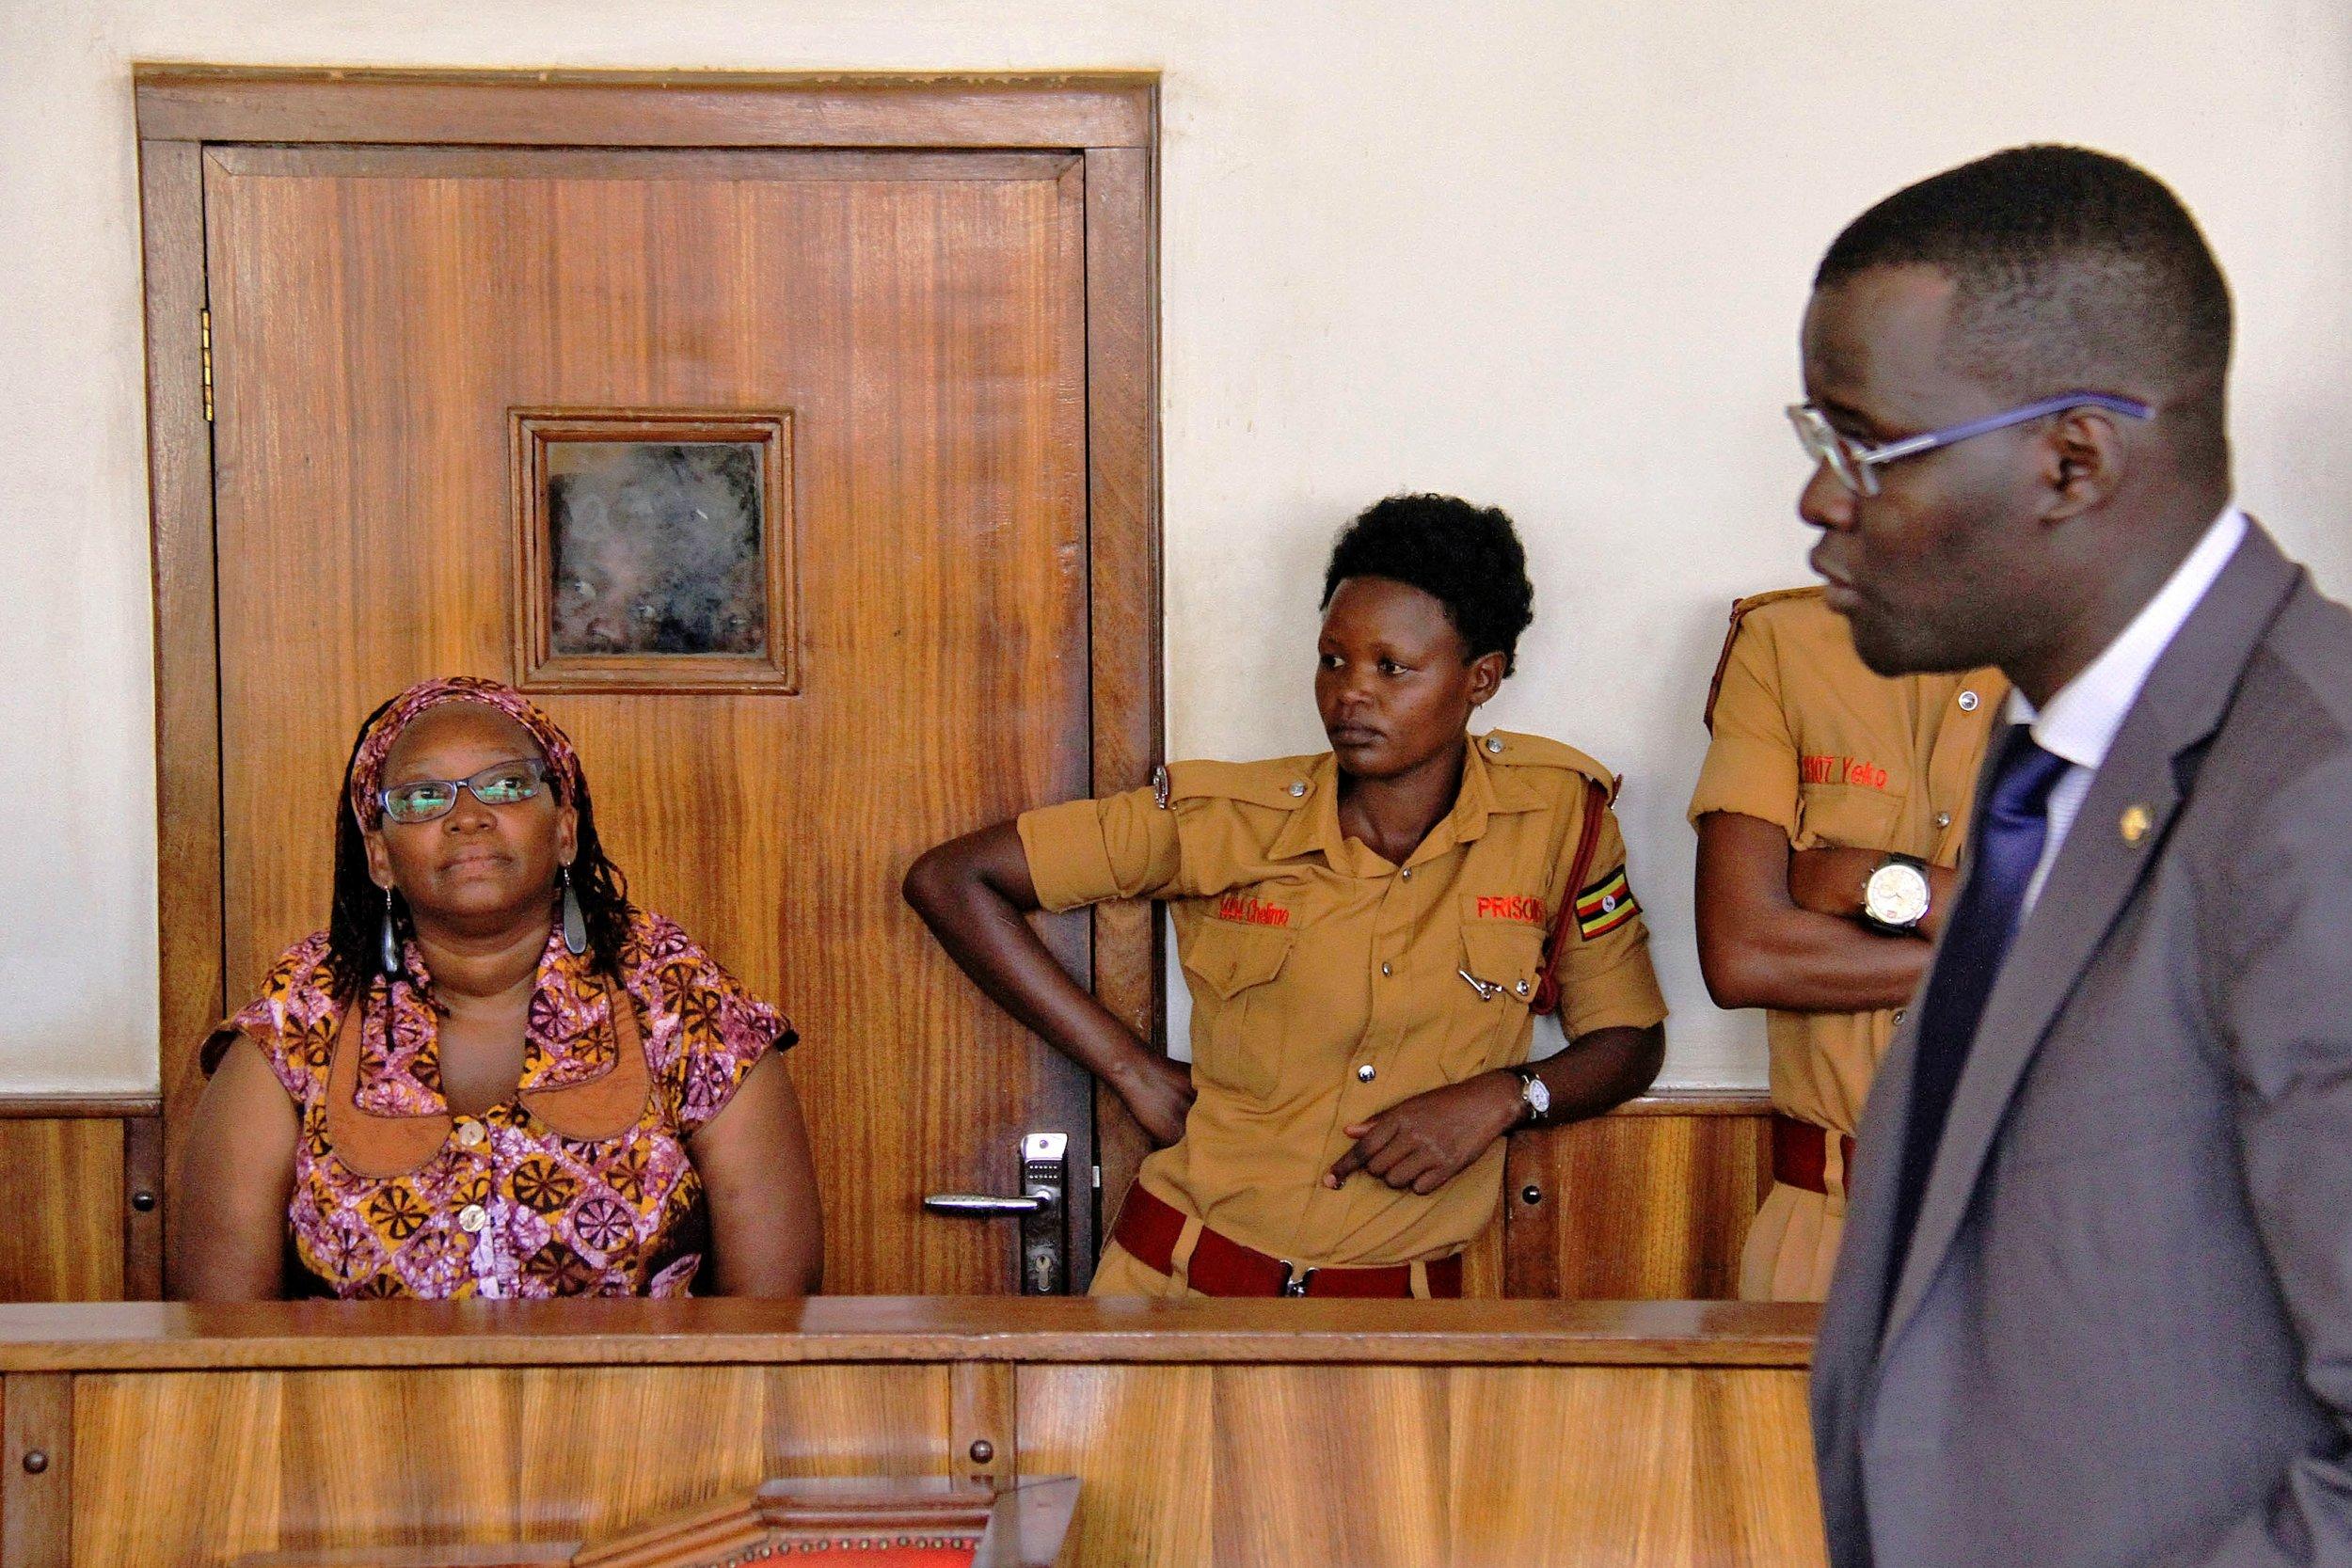 University lecturer and activist Doctor Stella Nyanzi